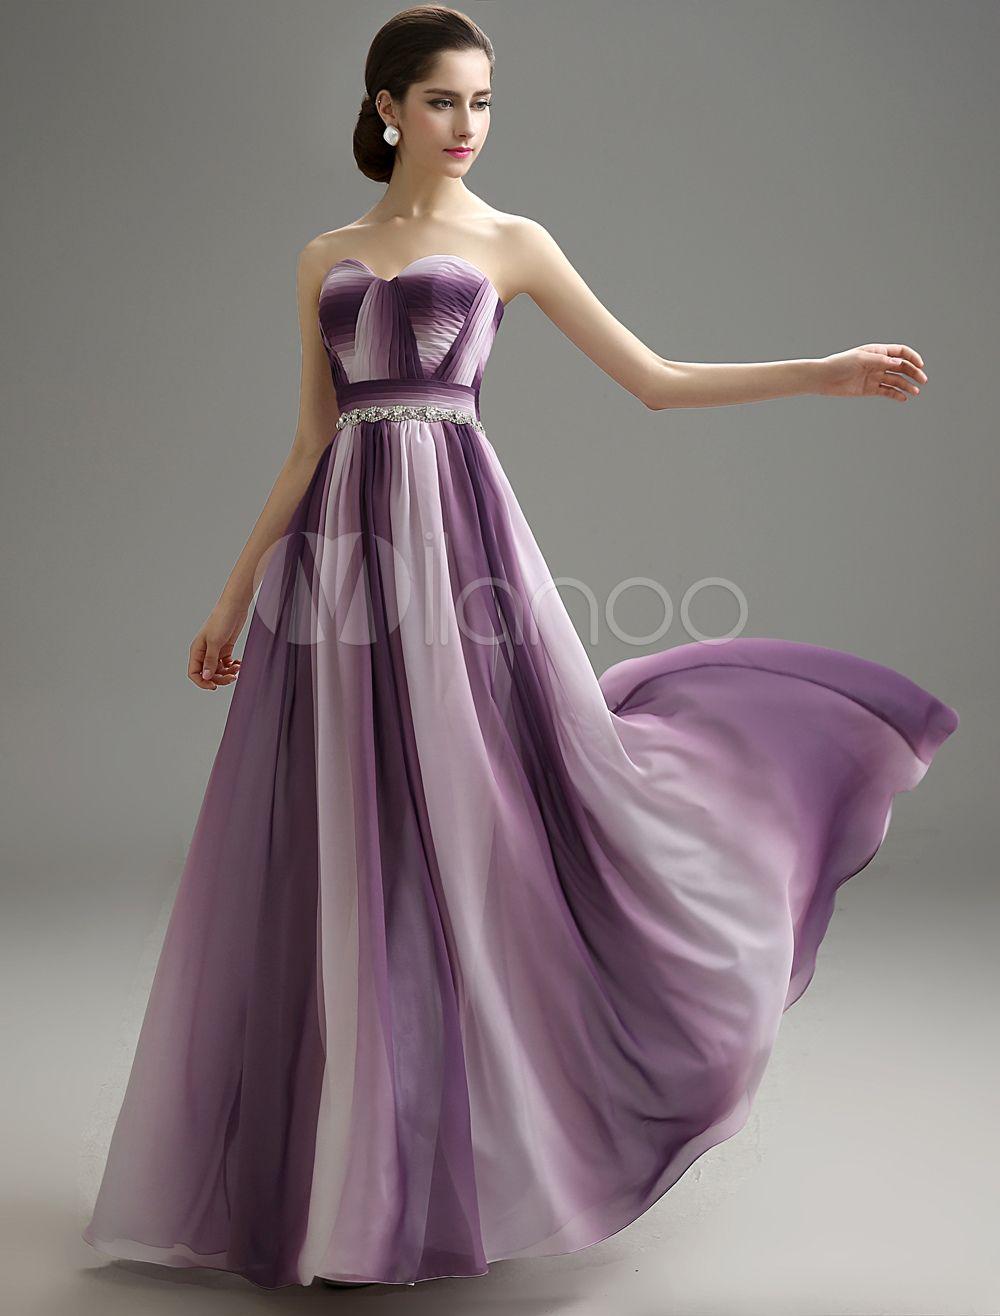 Ivory Ombrea Strapless Pleated Chiffon Prom Dress - Milanoo.com ...